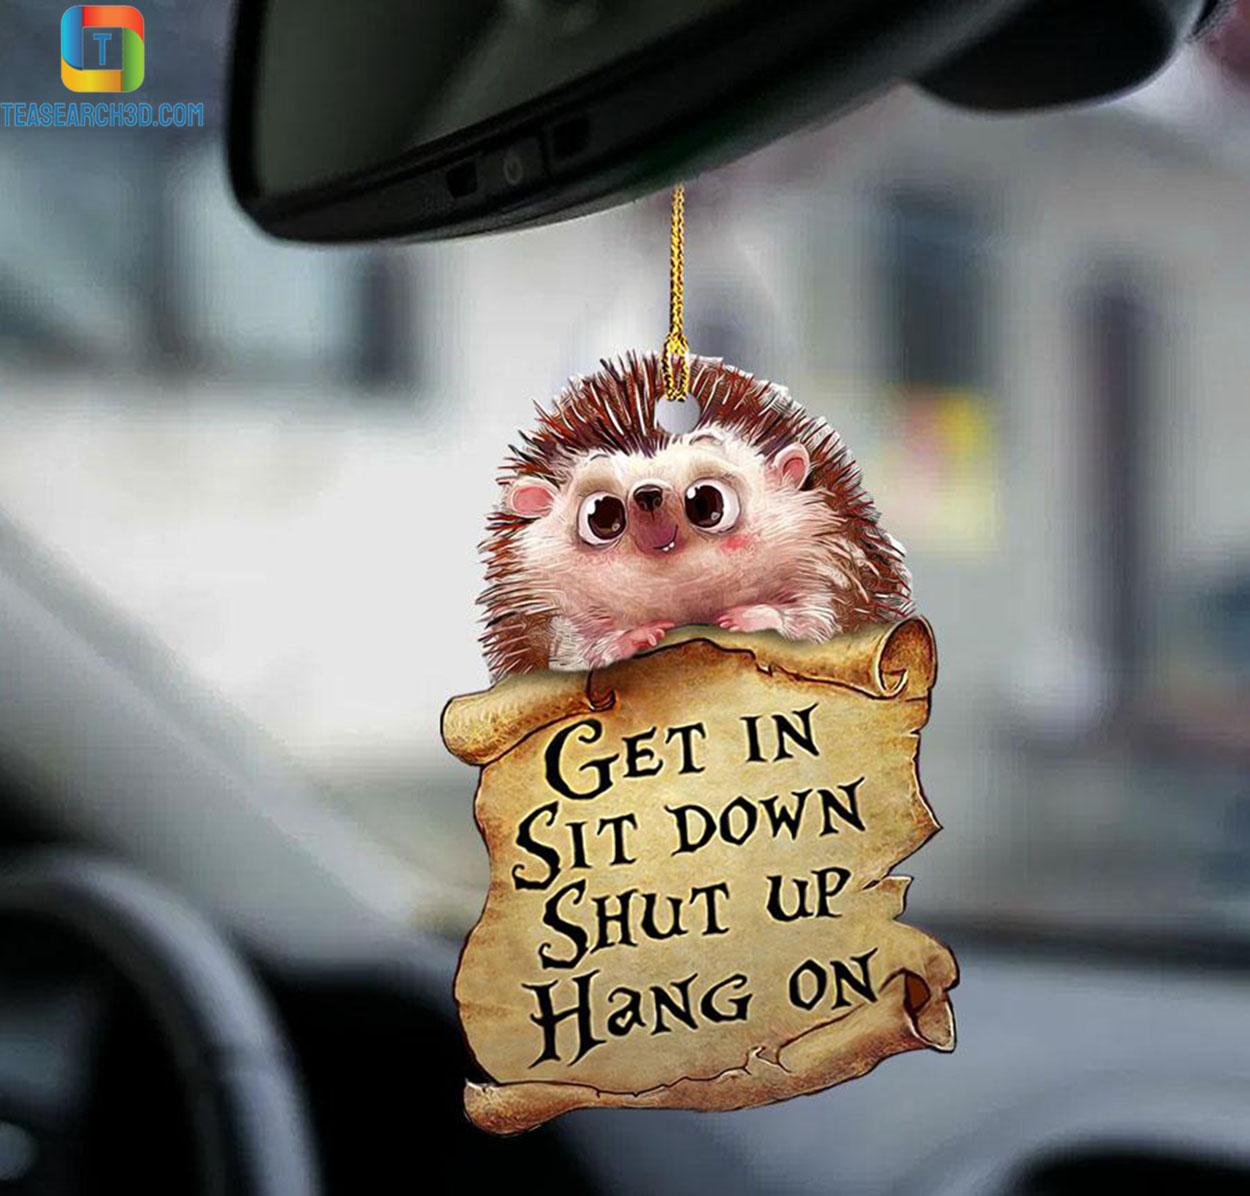 Hedgehog get in sit down shut up hang on car hanging ornament 1